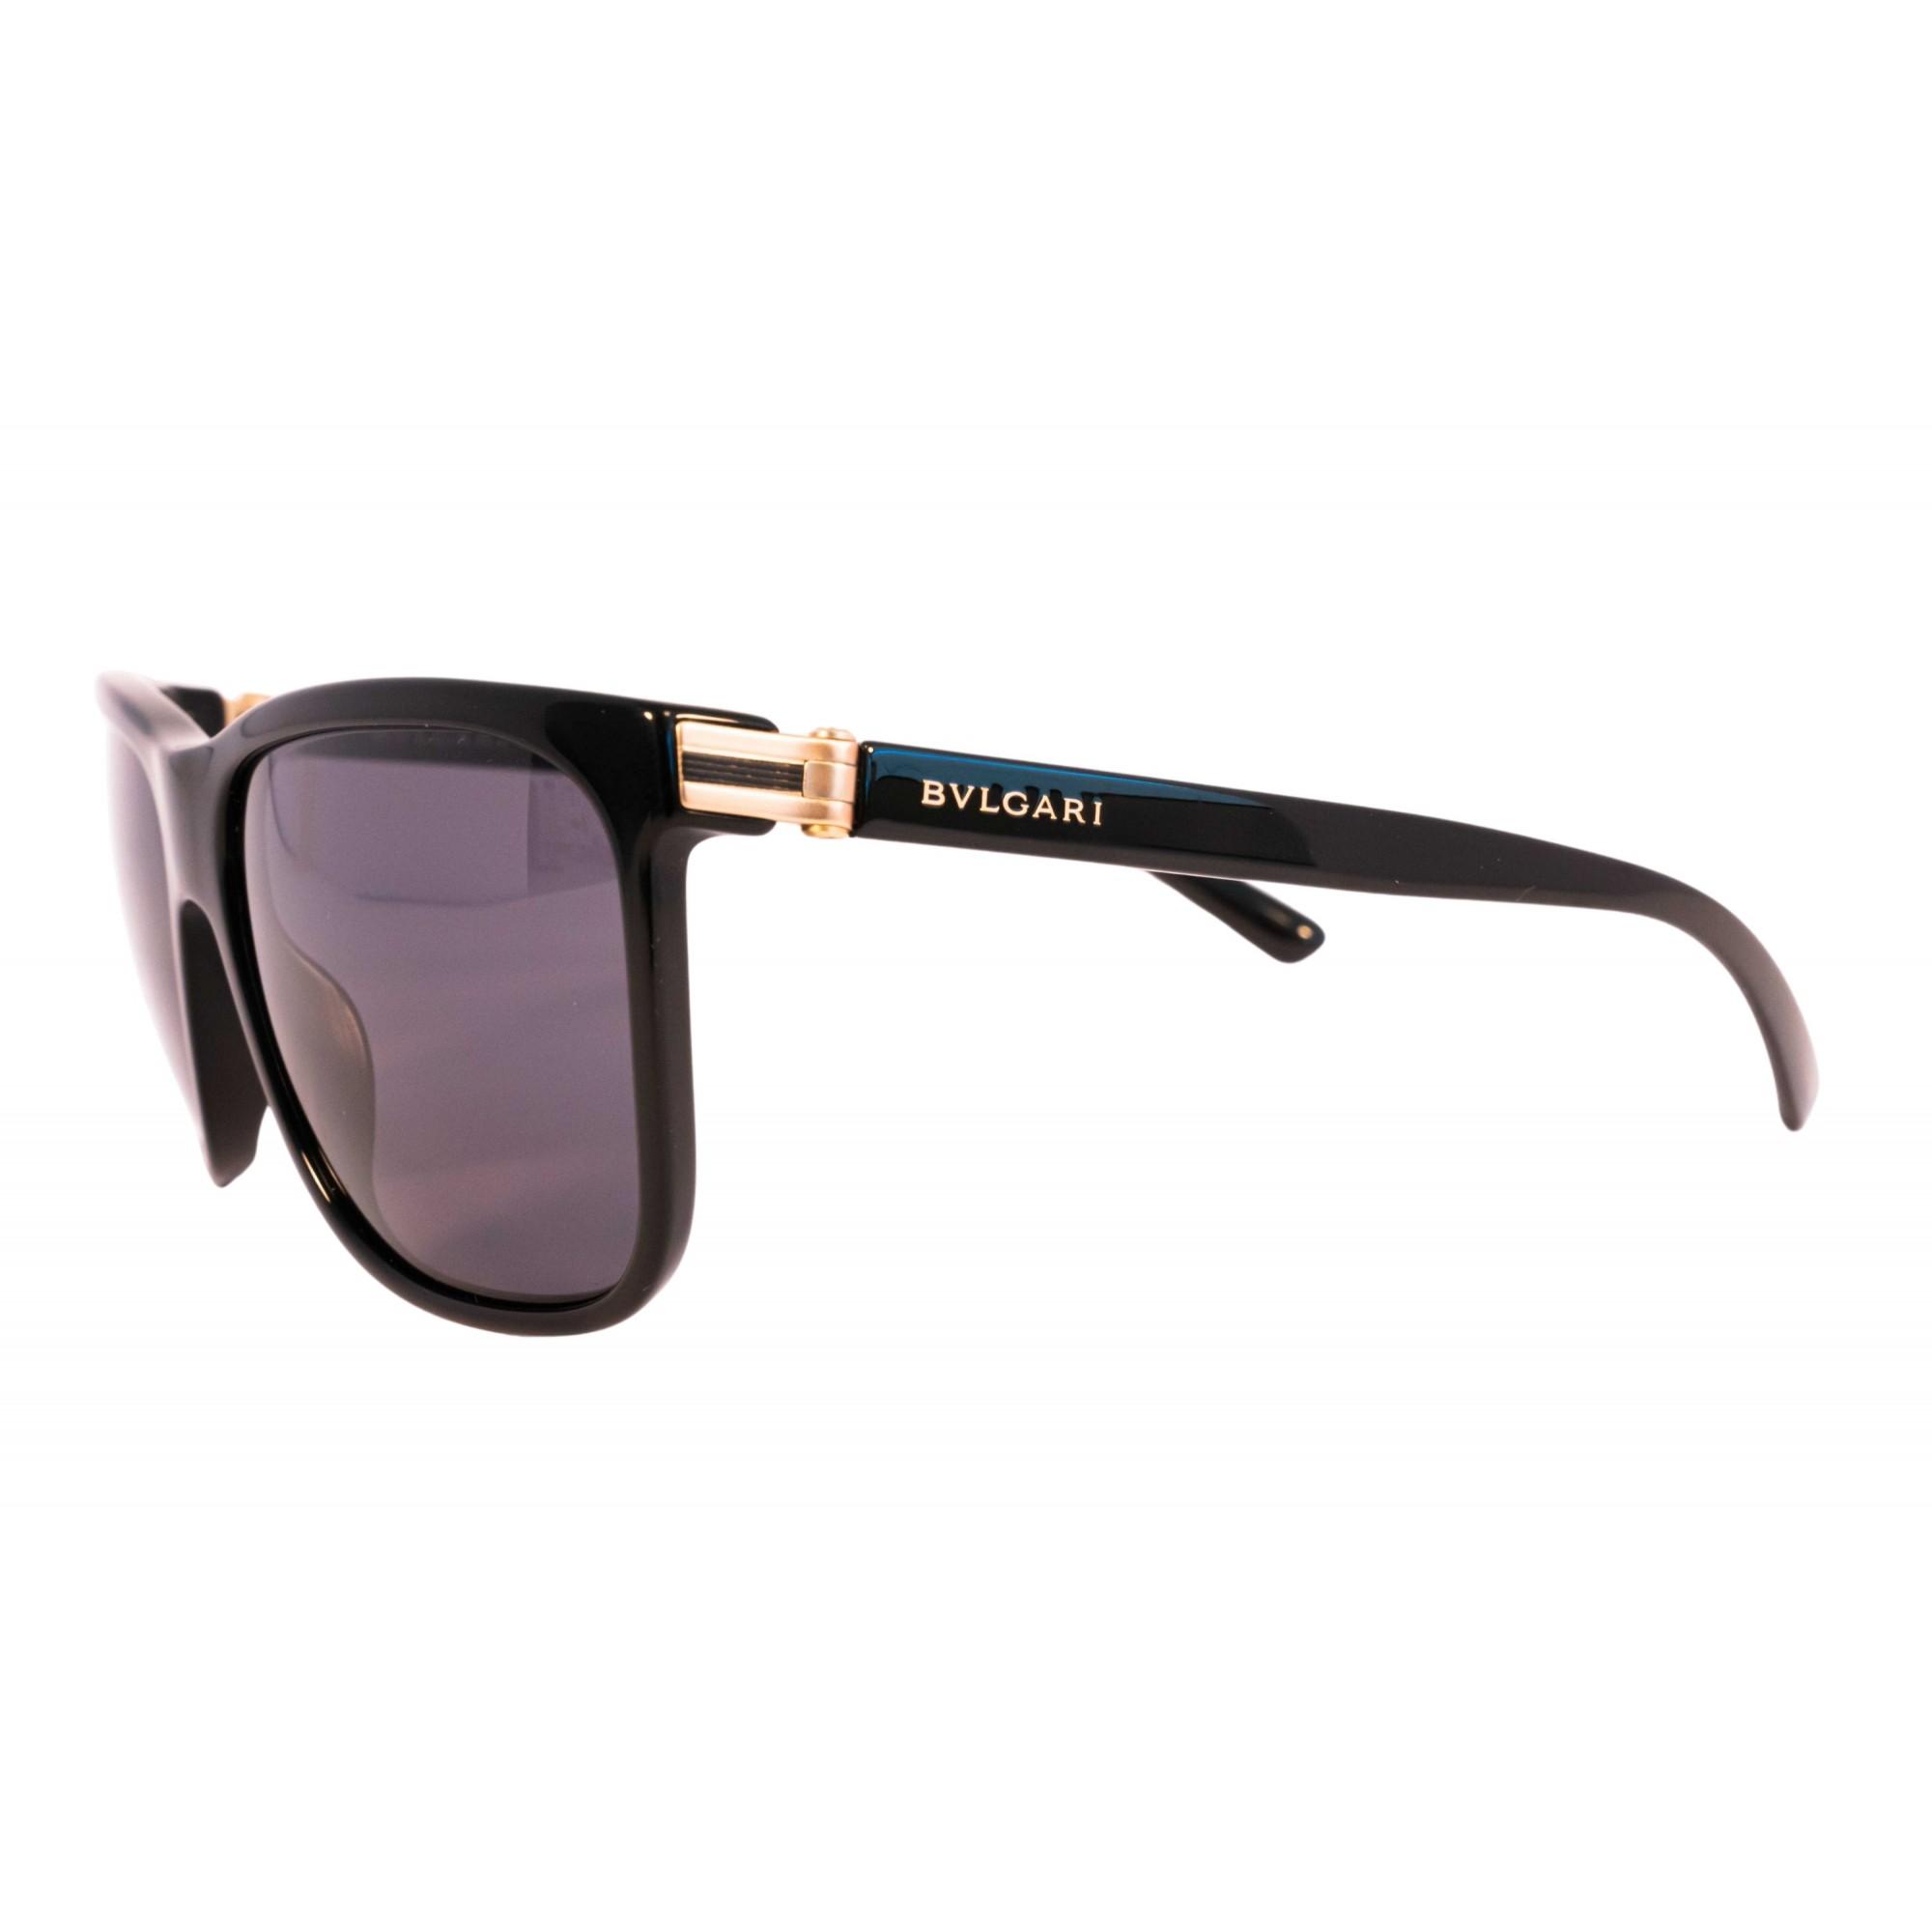 Óculos Bvlgari Clássico bv7027 50473 57 Tartaruga